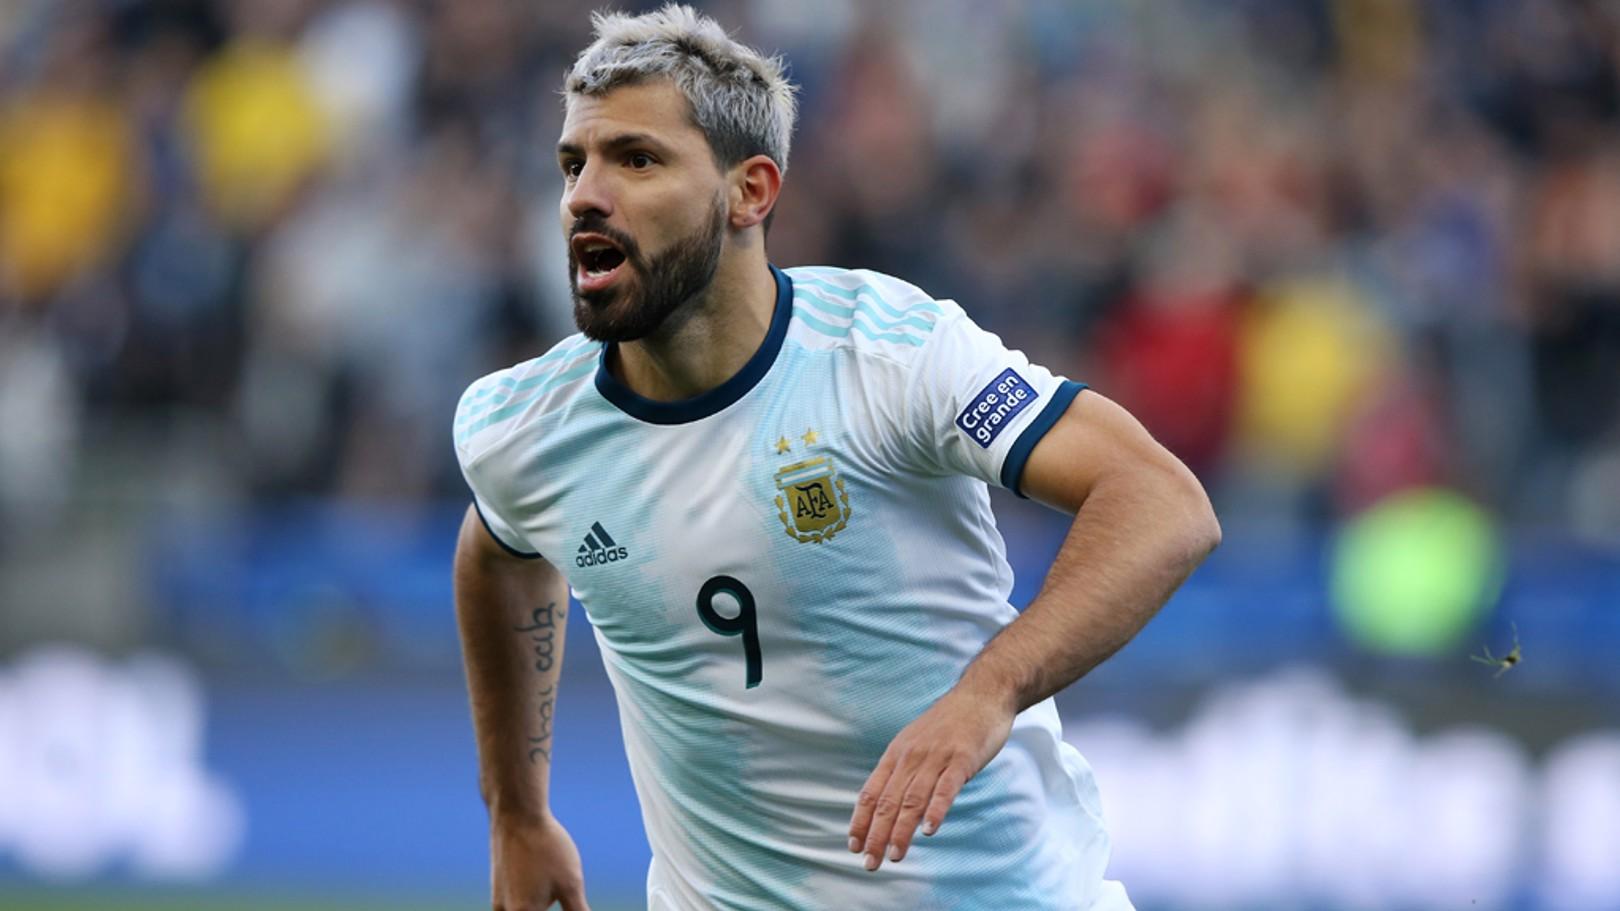 SERGIO AGÜERO. Gol con Argentina ante Uruguay.